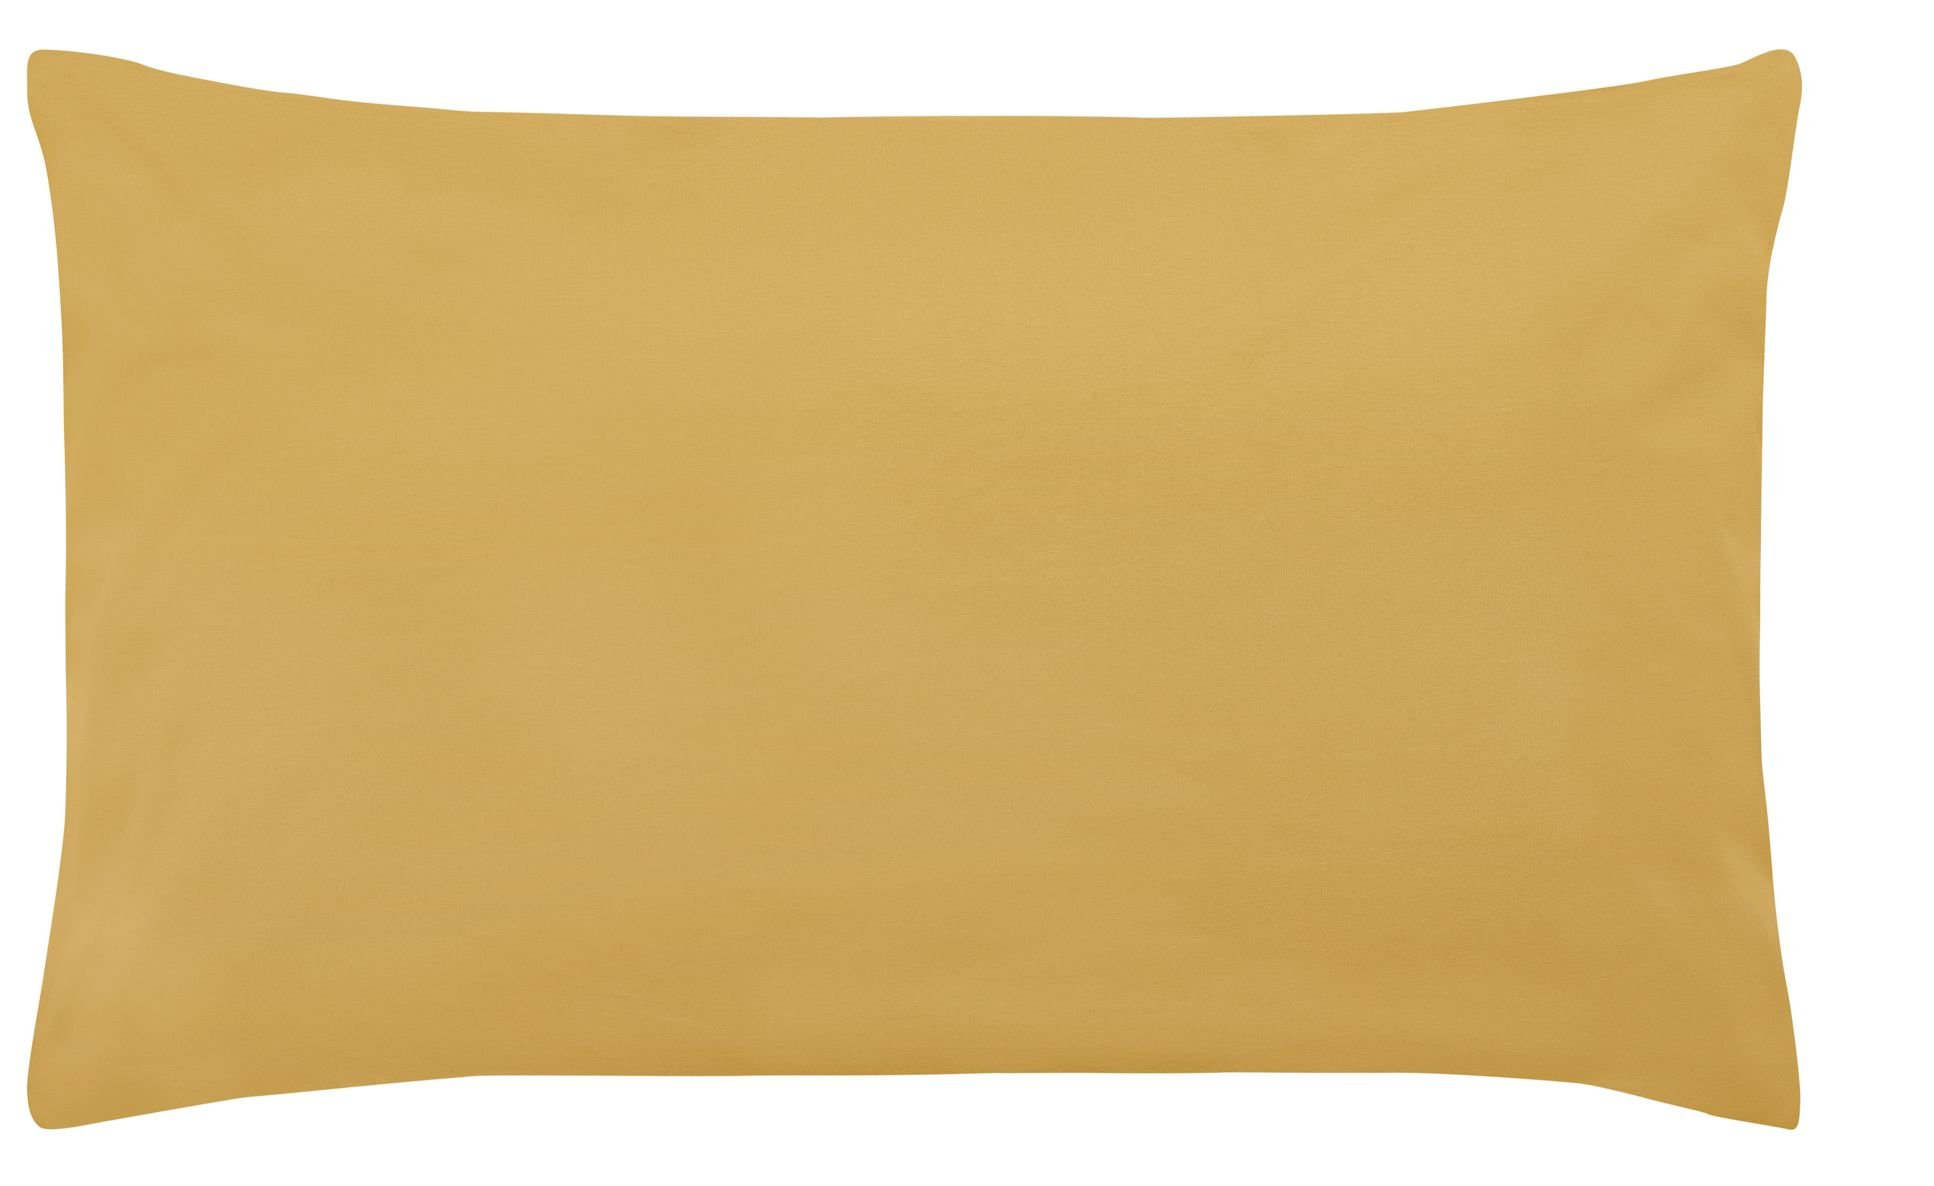 Edel-Zwirn-Jersey curry B40cm